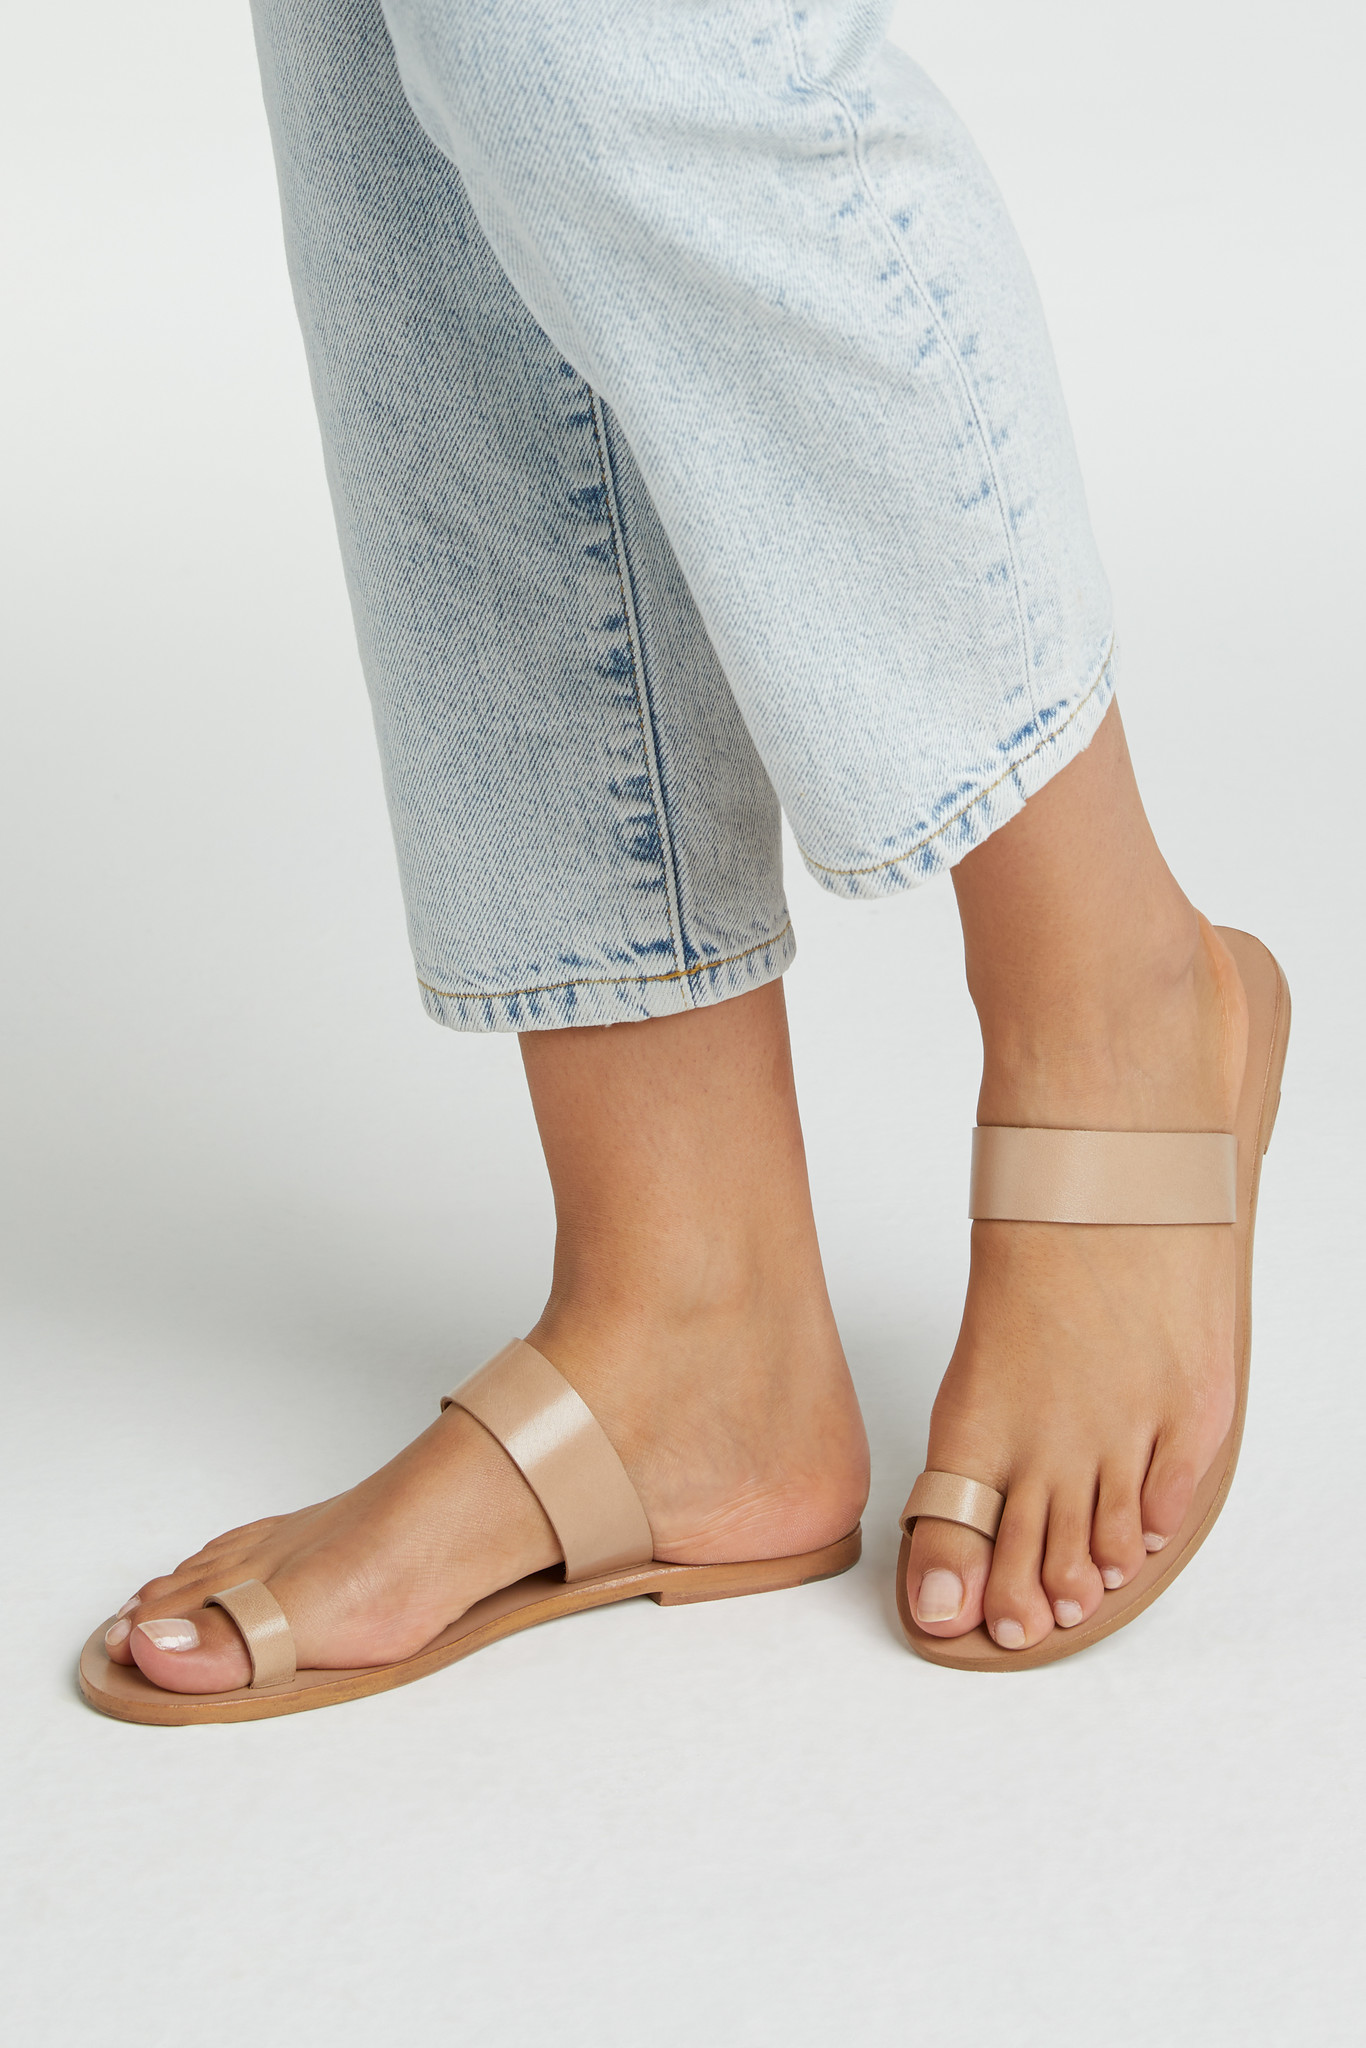 yaya Leather slipper 1343084-115-3